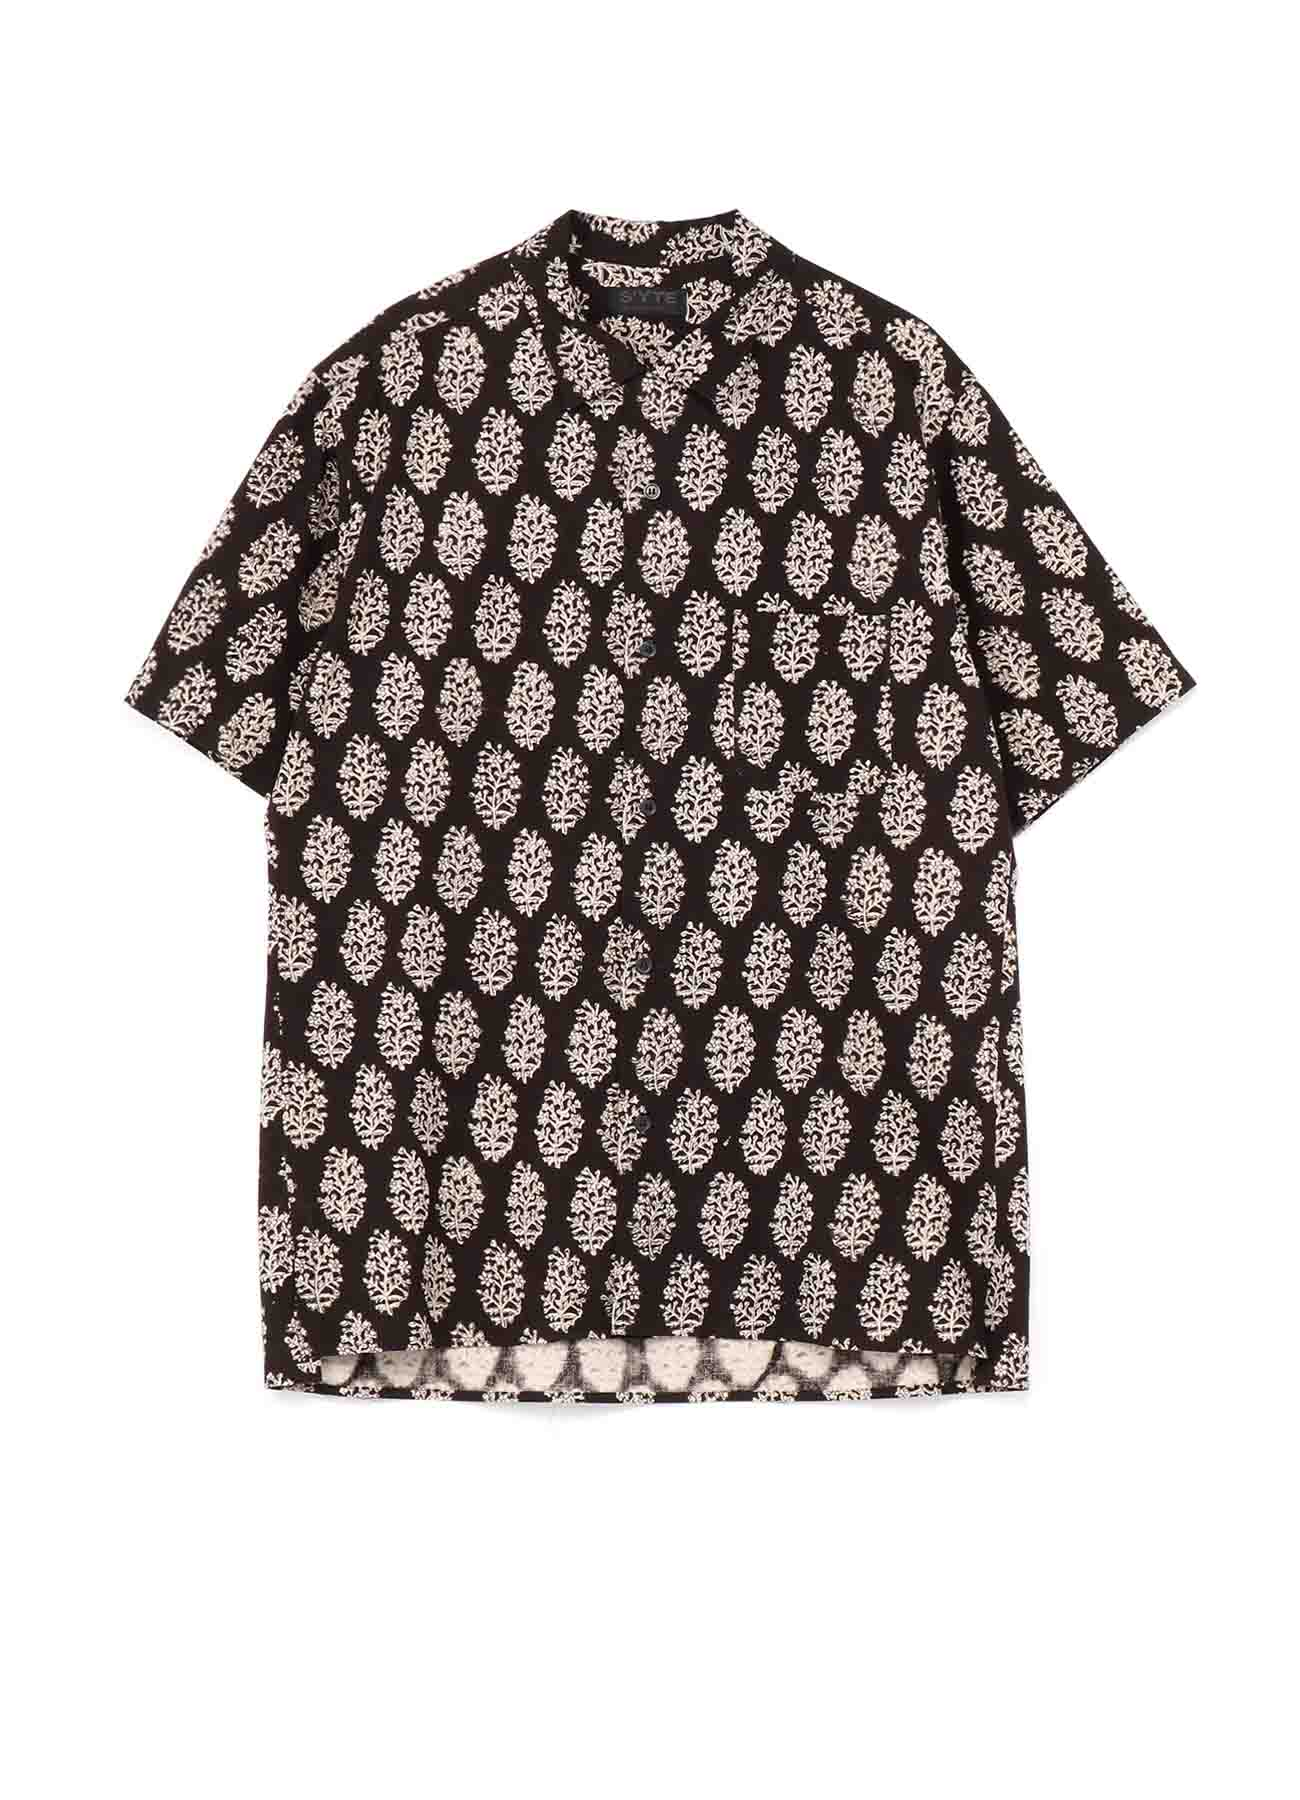 Indian Botanical Black Block Print Open collar Lose Fit Short Sleeve Shirt